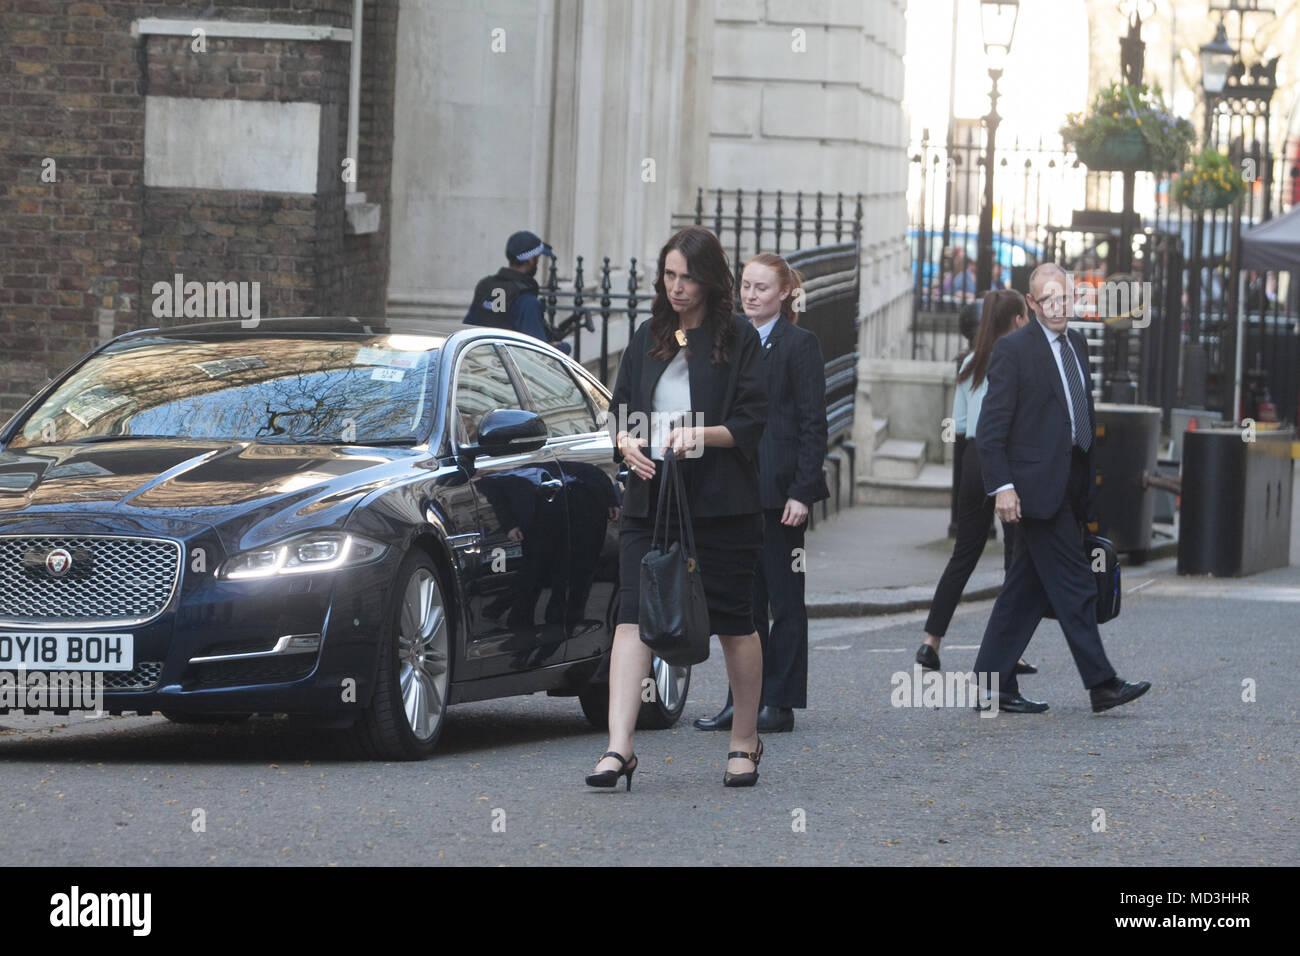 London UK  18th April 2018  The Prime Minister of New